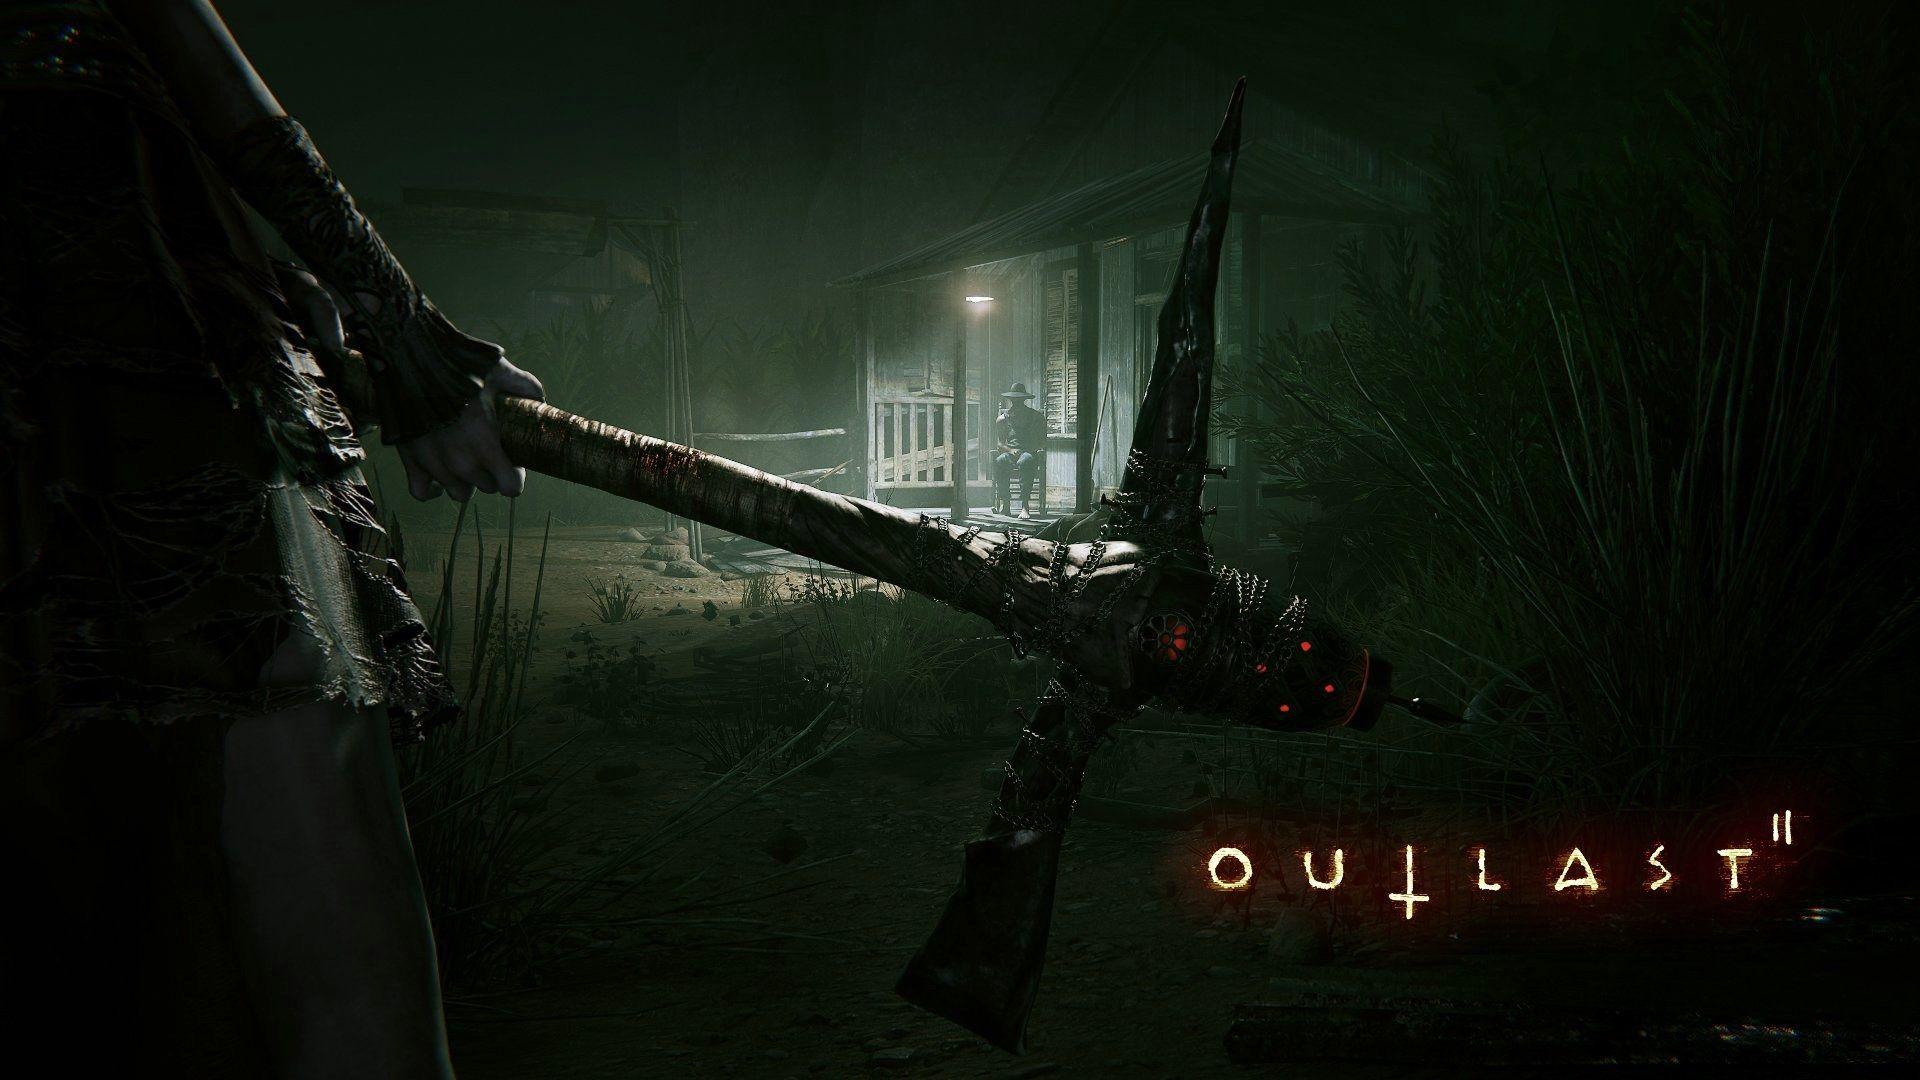 1920x1080 Outlast 2 Hd Latest Wallpaper Outlast 2 Outlast Ii Outlast 2 Gameplay